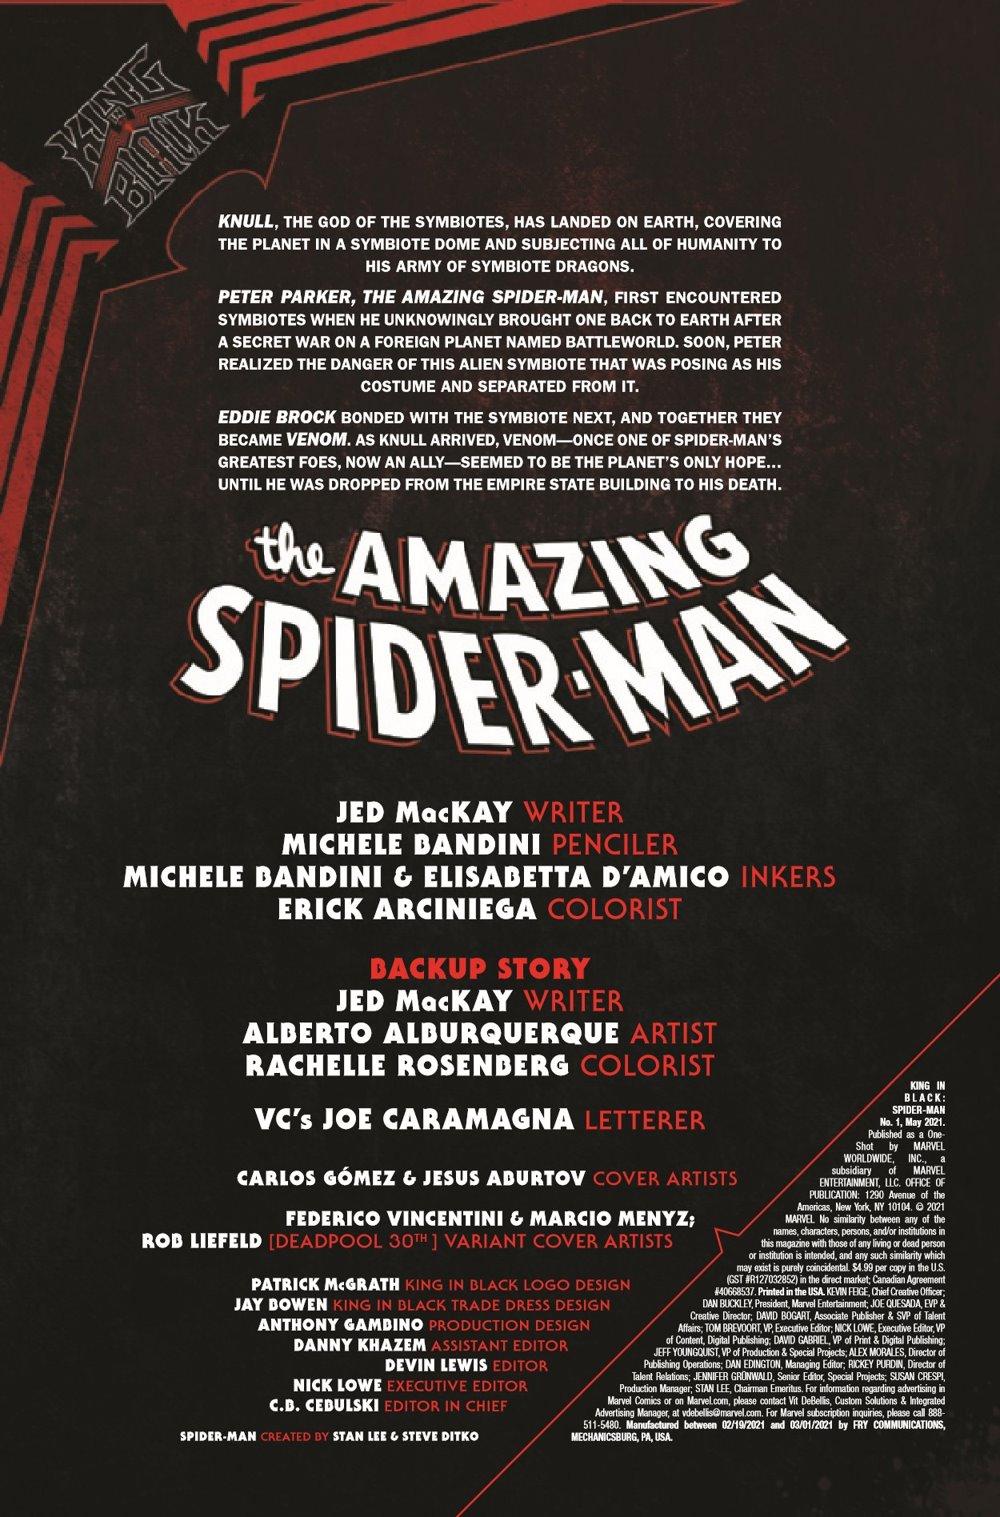 SMKIB2021001_Preview-2 ComicList Previews: KING IN BLACK SPIDER-MAN #1